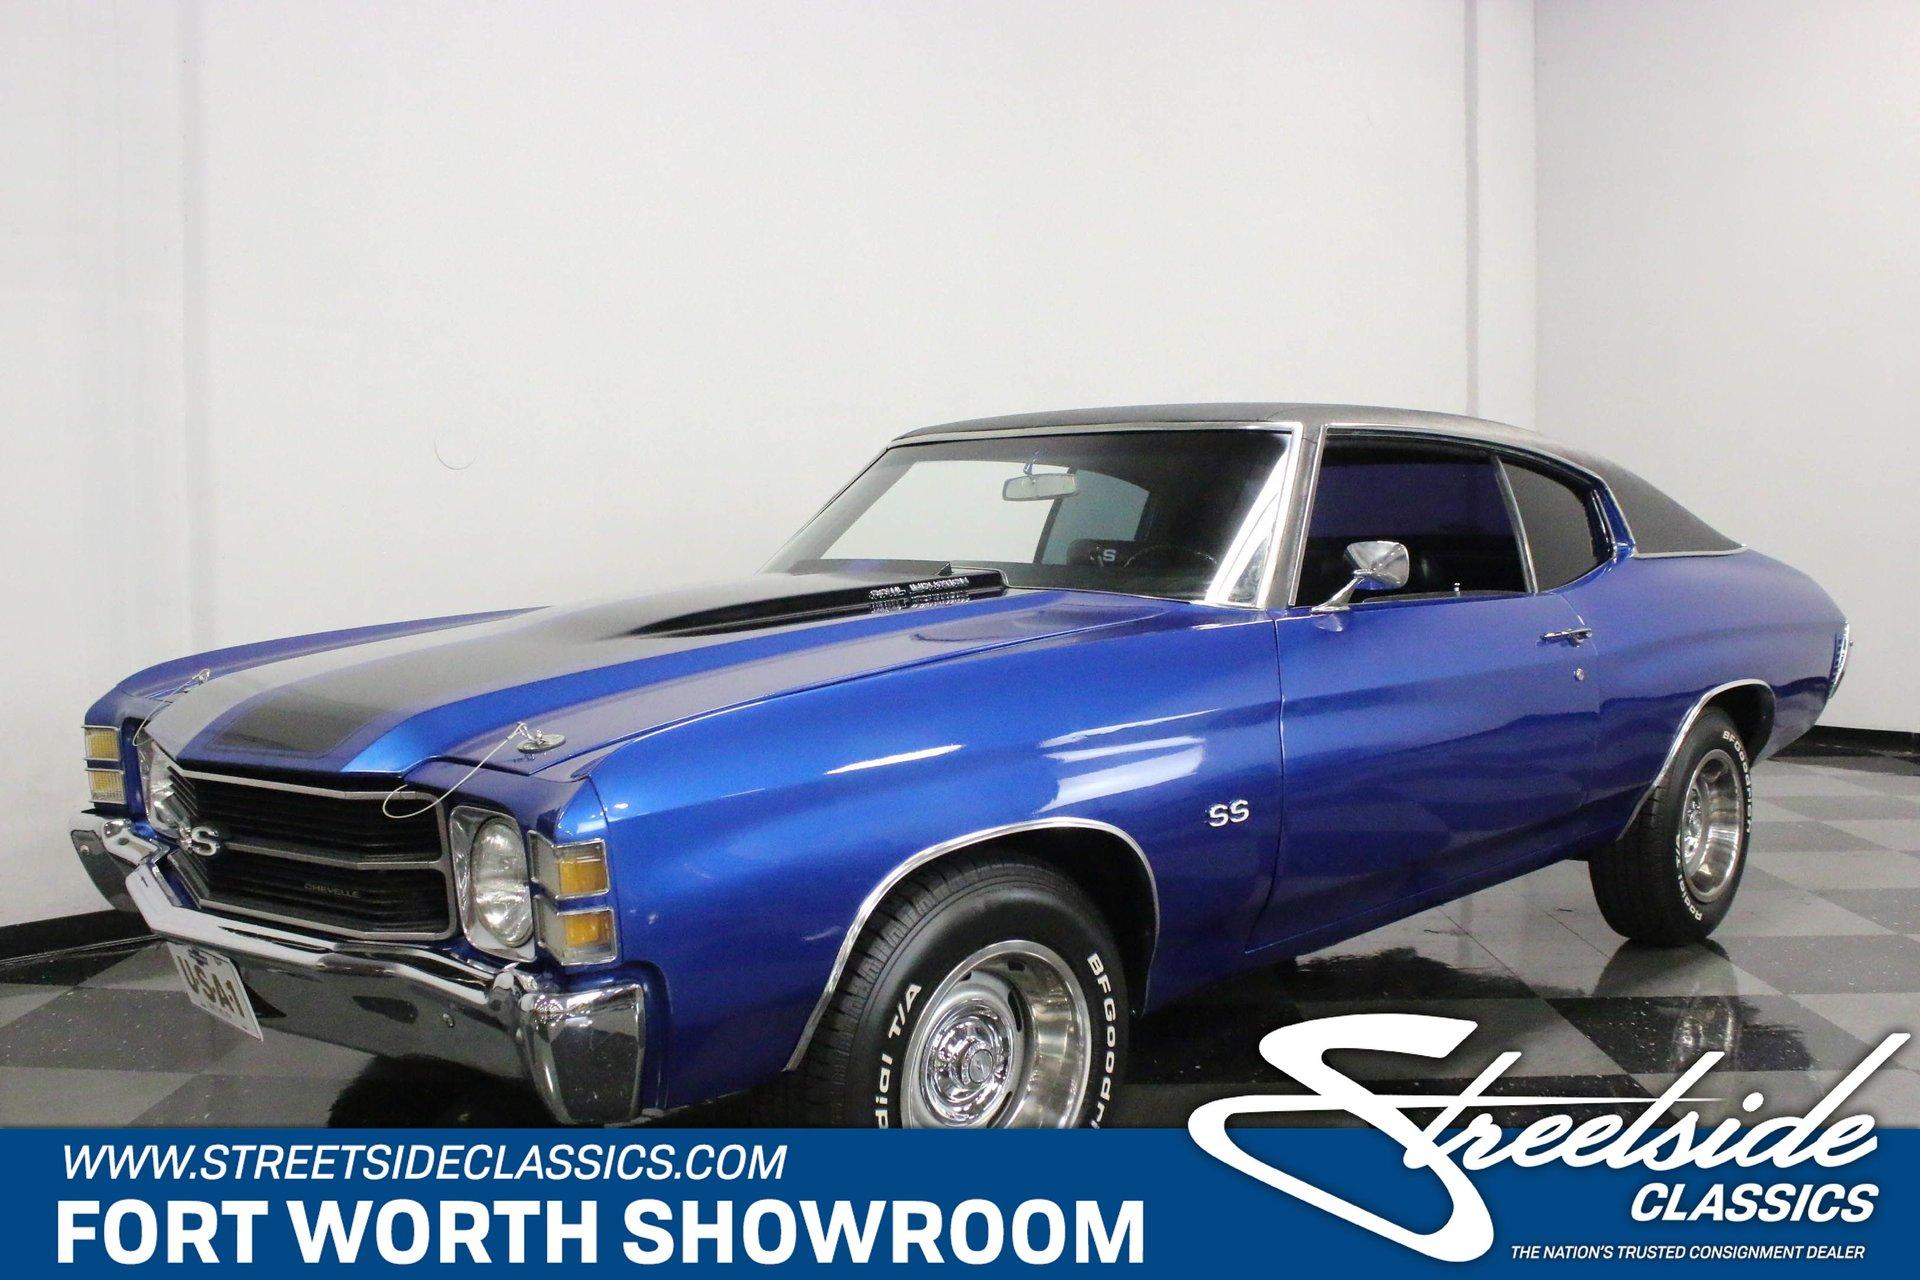 1971 chevrolet chevelle ss 350